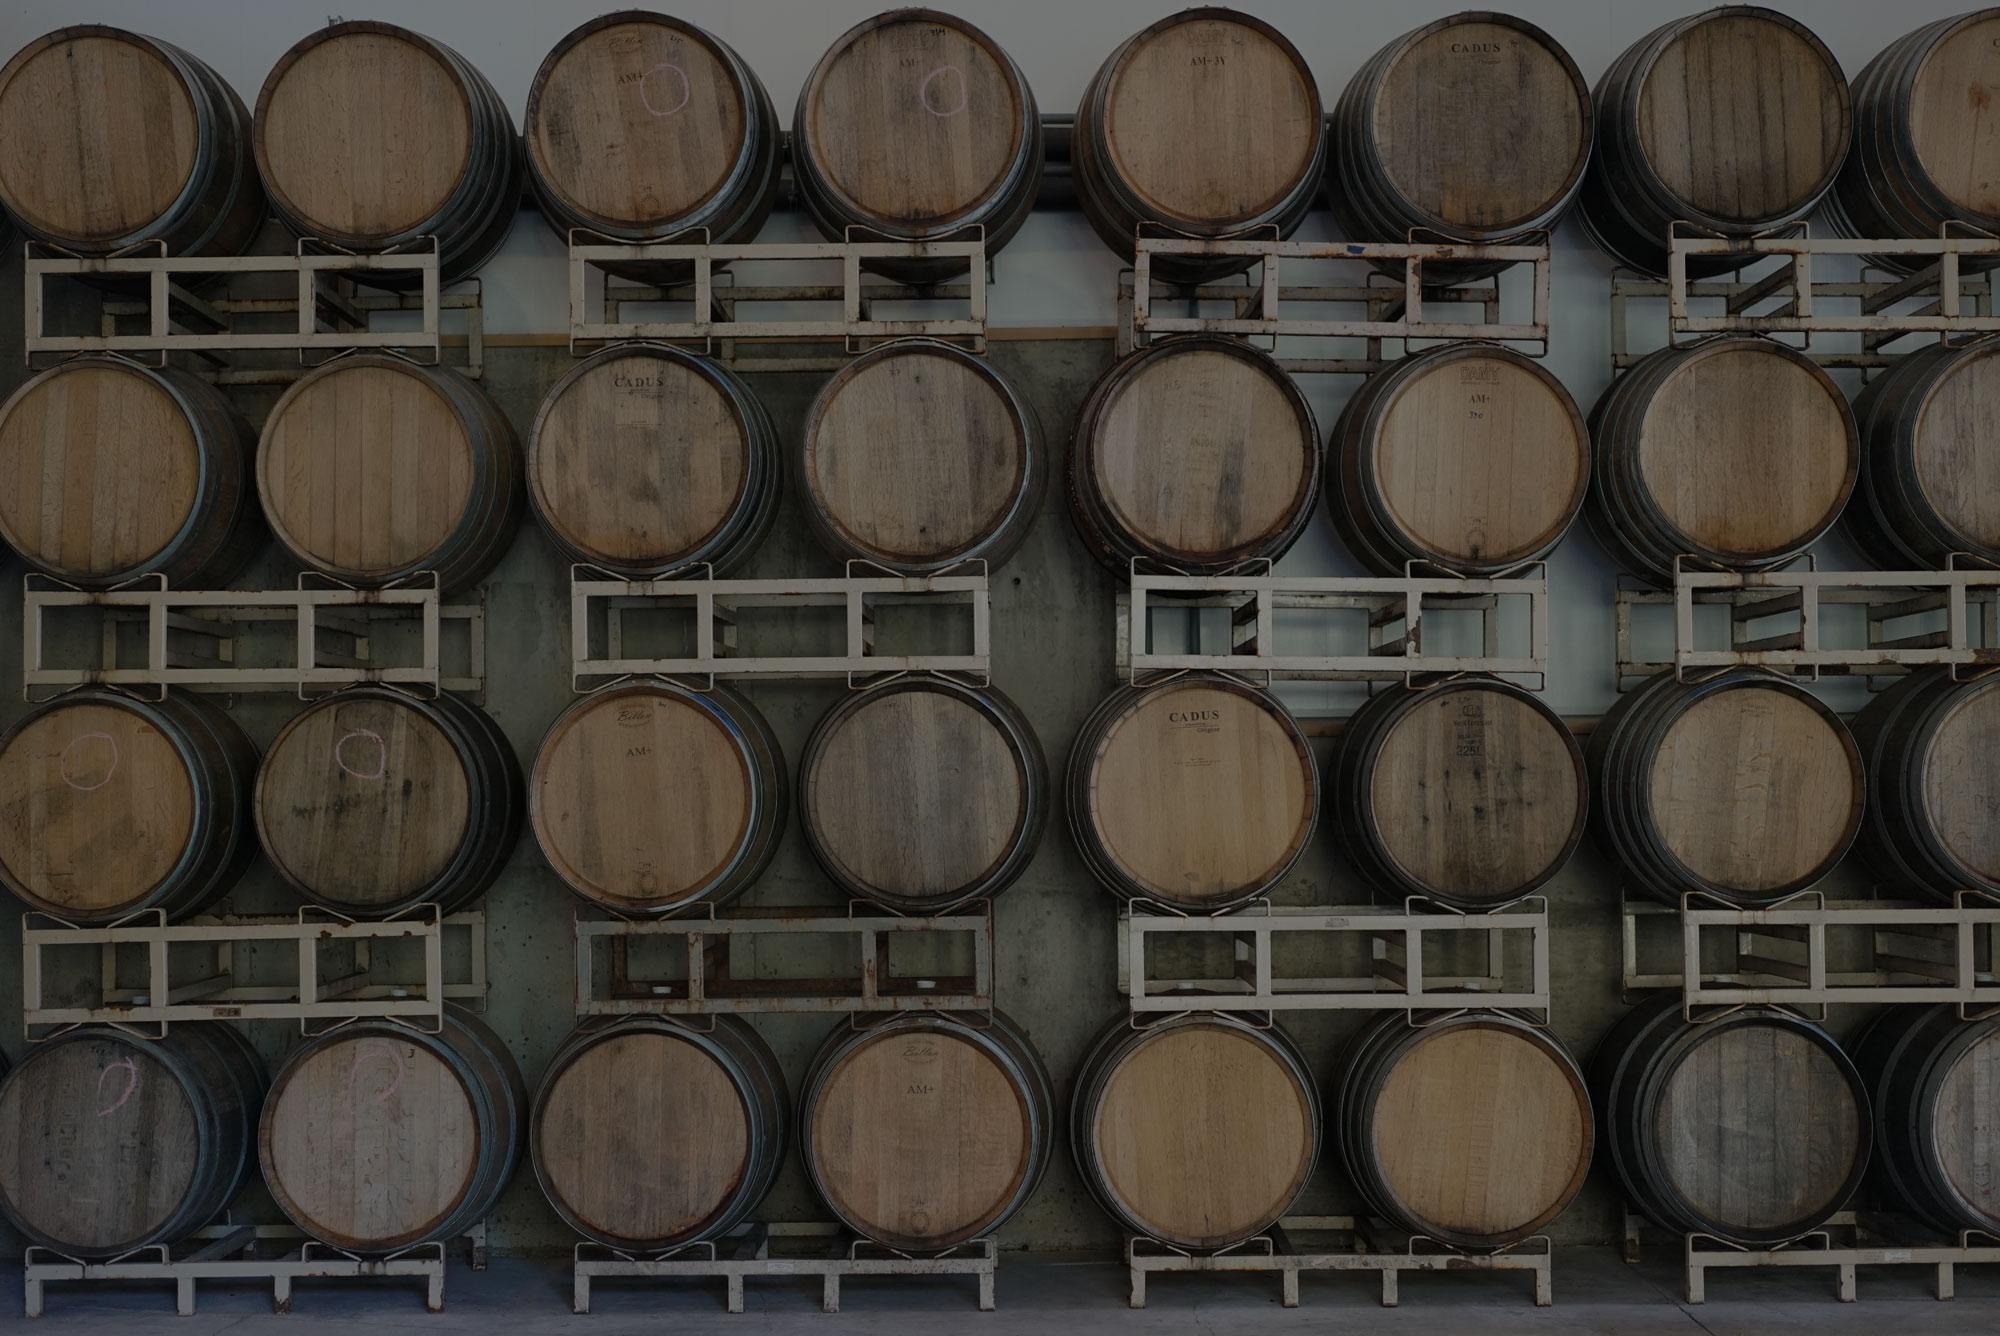 Best Oregon winery barrel room